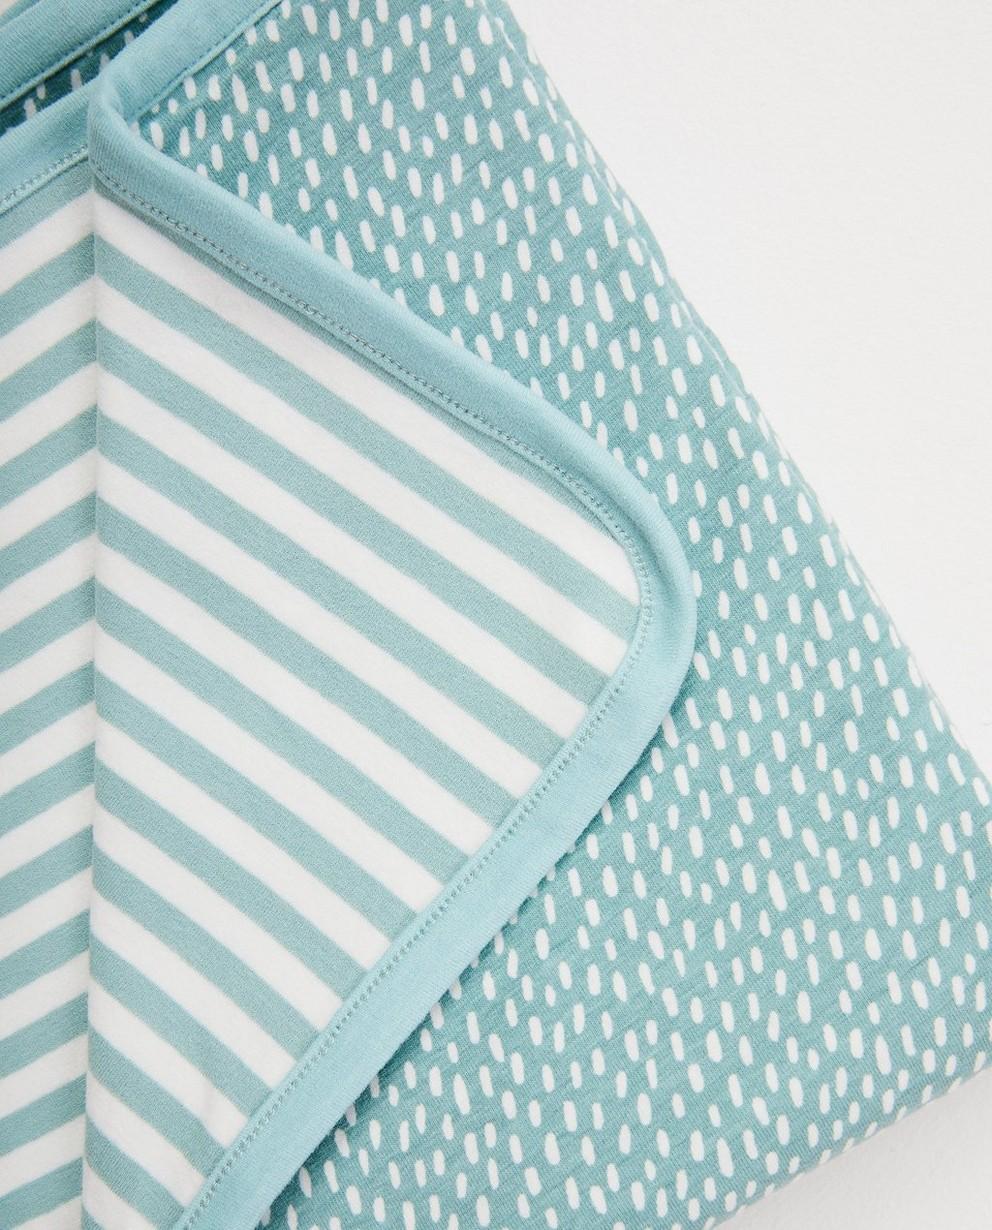 Babyspulletjes - BLM - Lichtblauwe deken in biokatoen